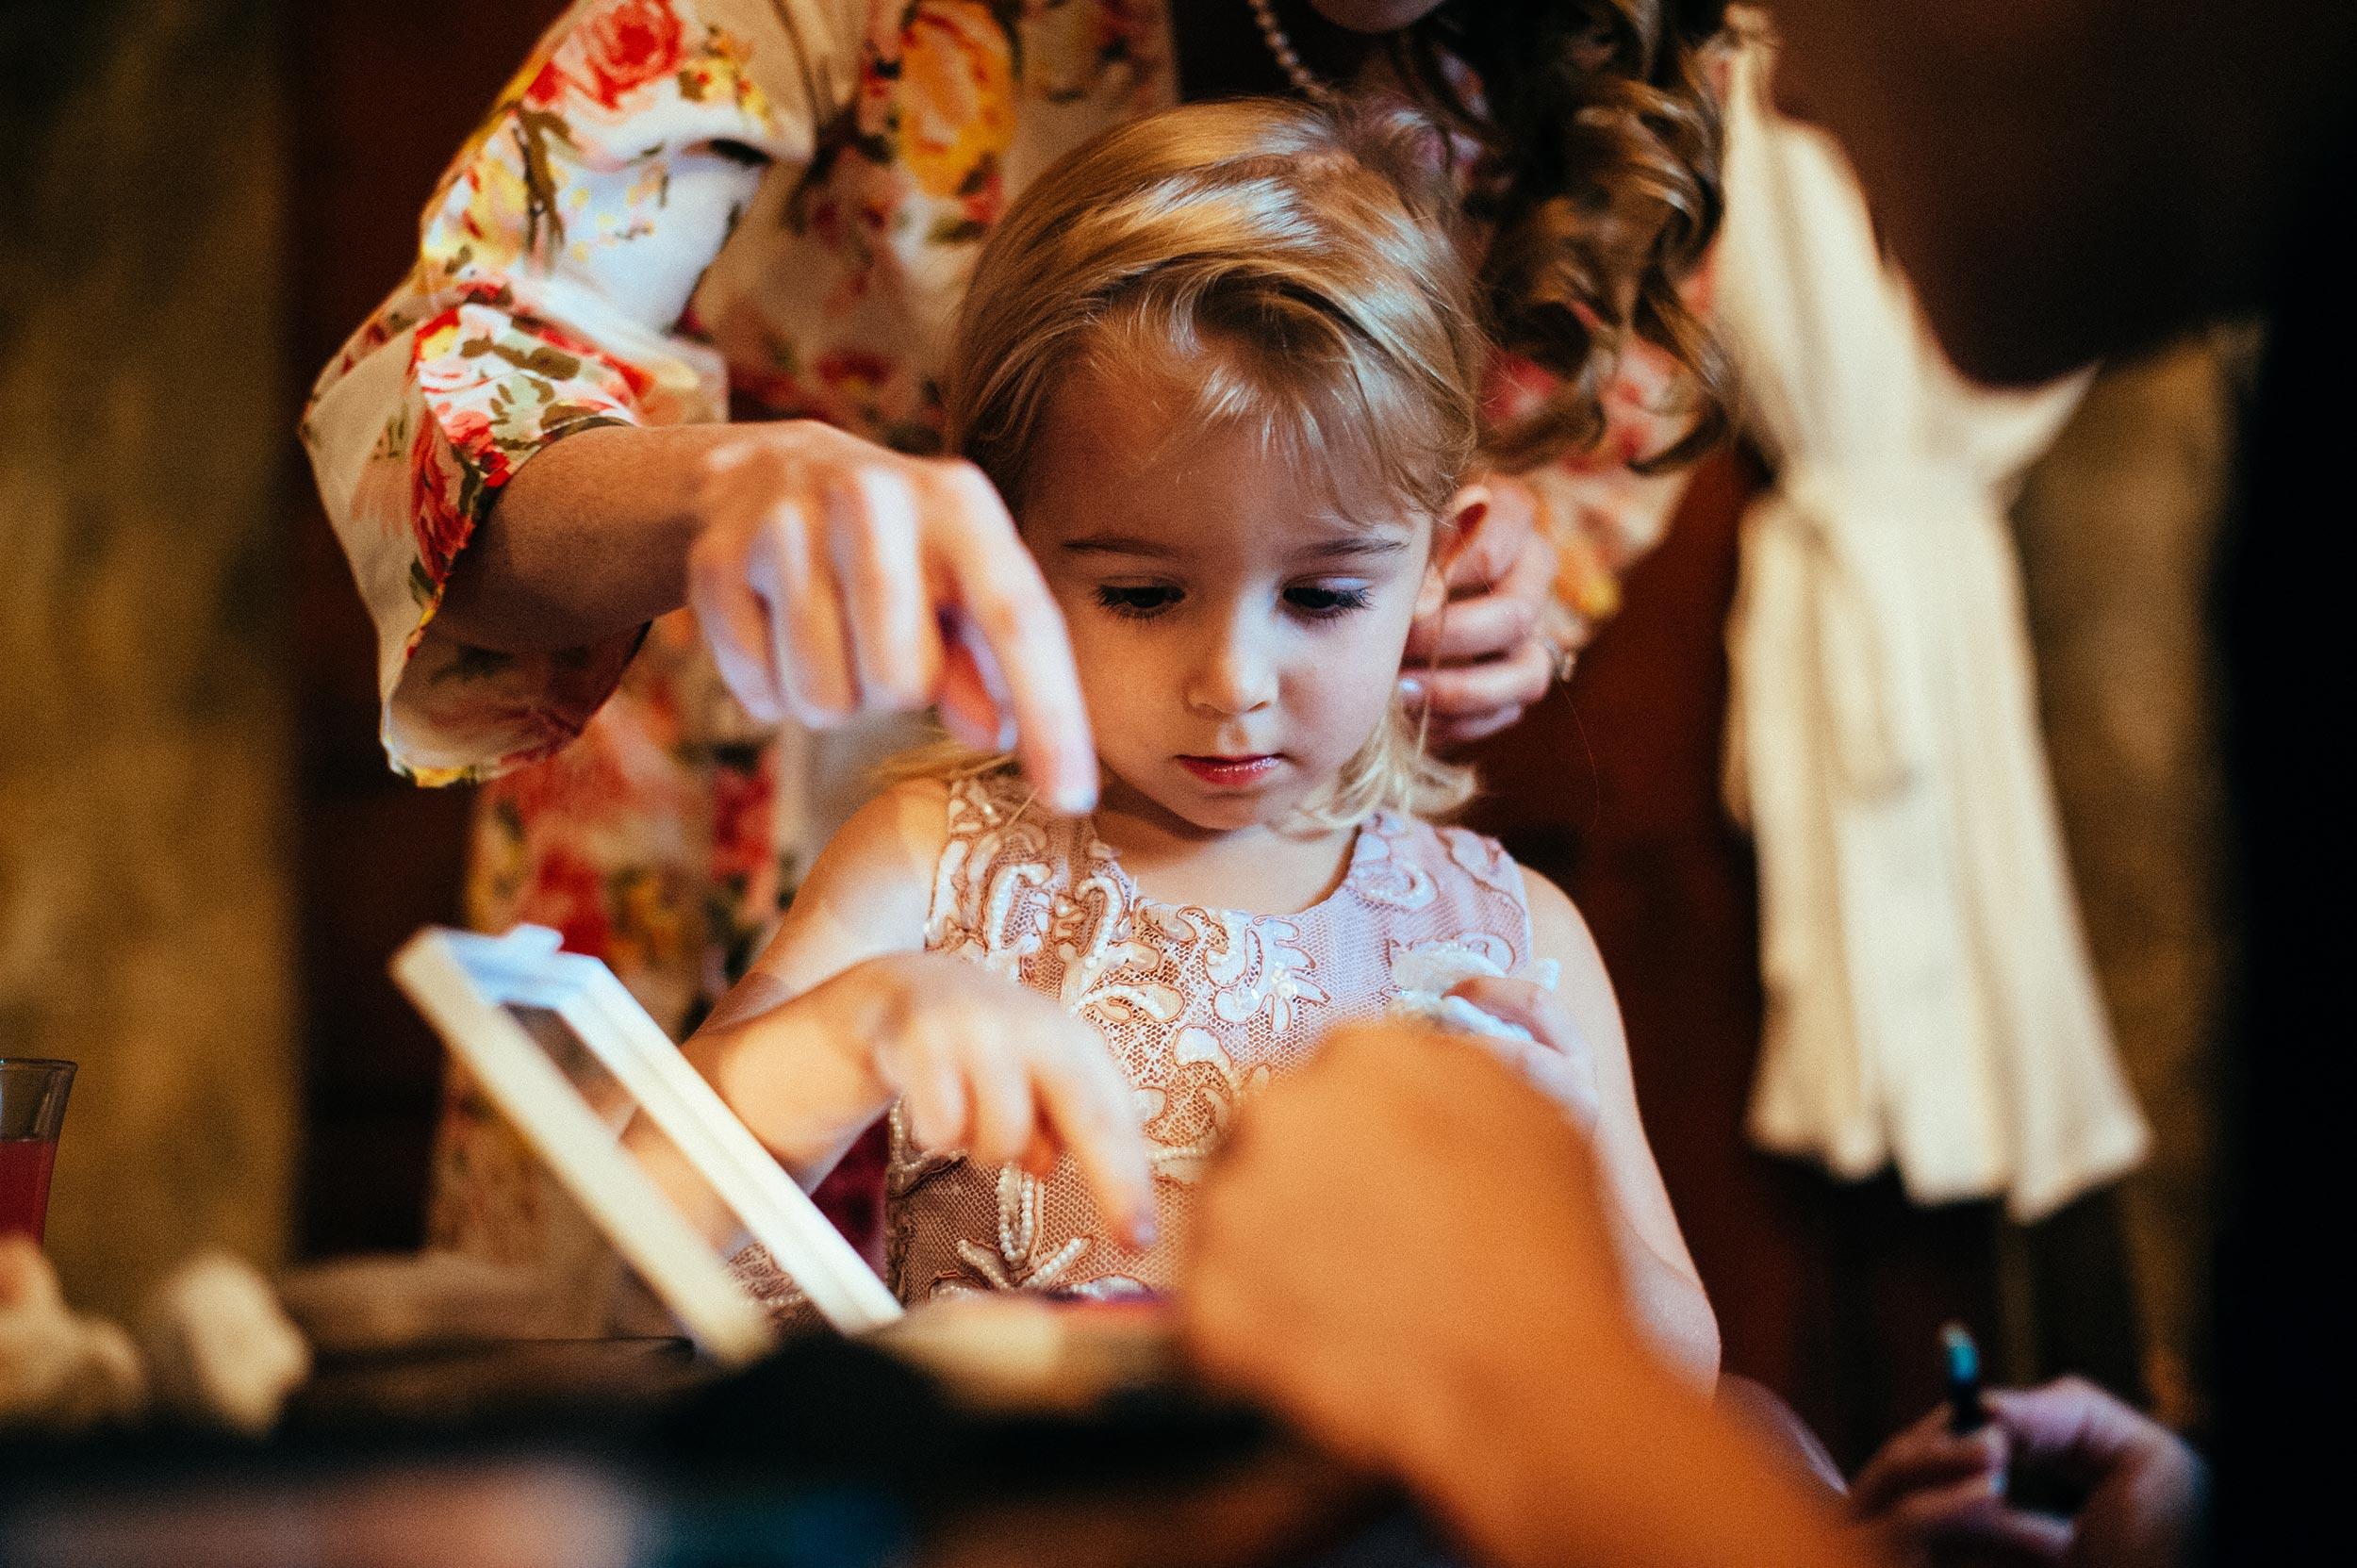 2014-Shelby-Jocelyn-Santo-Stefano-Di-Sessanio-Wedding-Photographer-Italy-Alessandro-Avenali-21.jpg